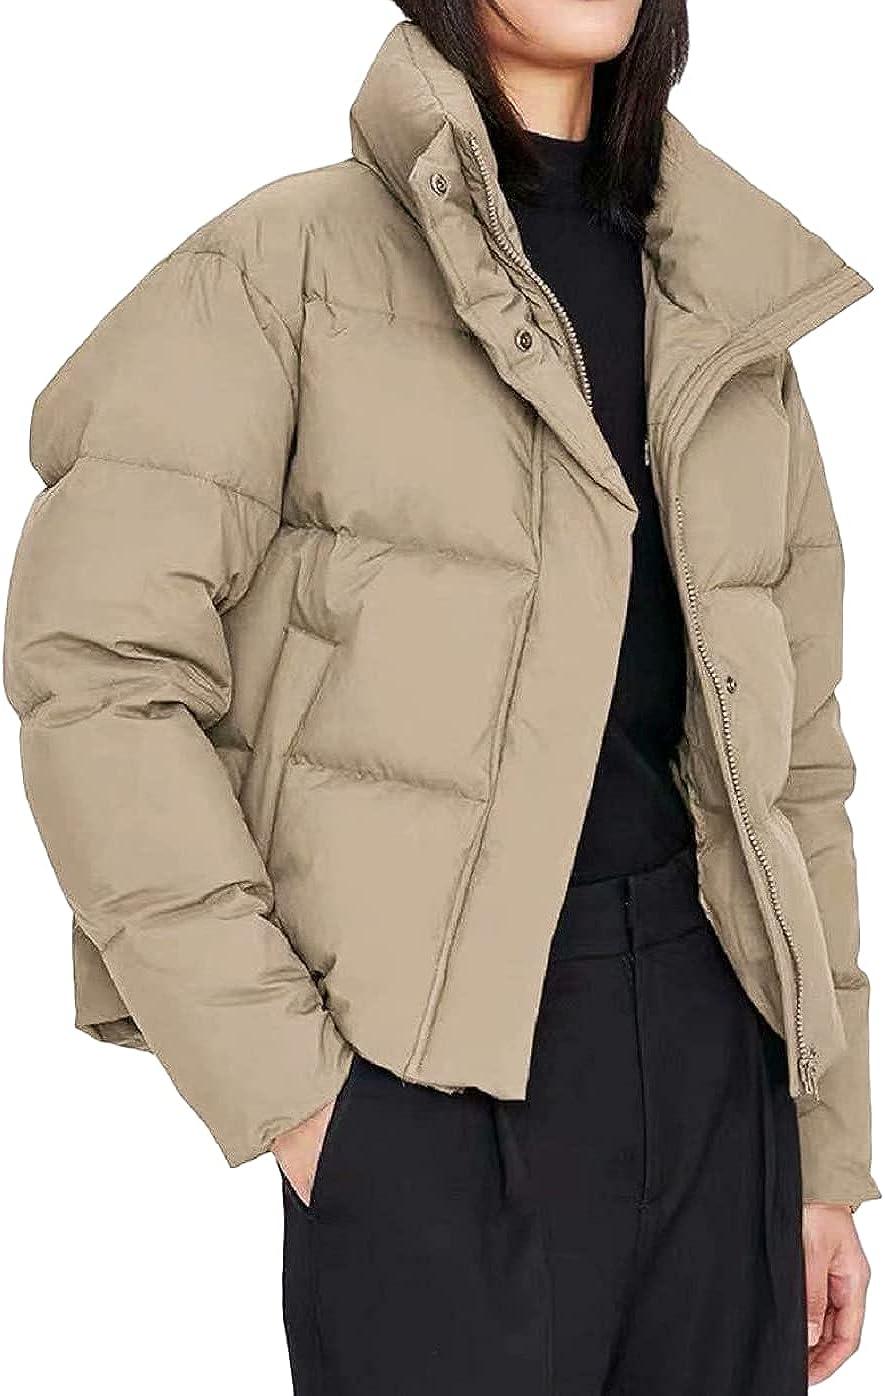 Chartou Women's Puffer Band Collar Chevron Quilted Warm Short Coat Tops